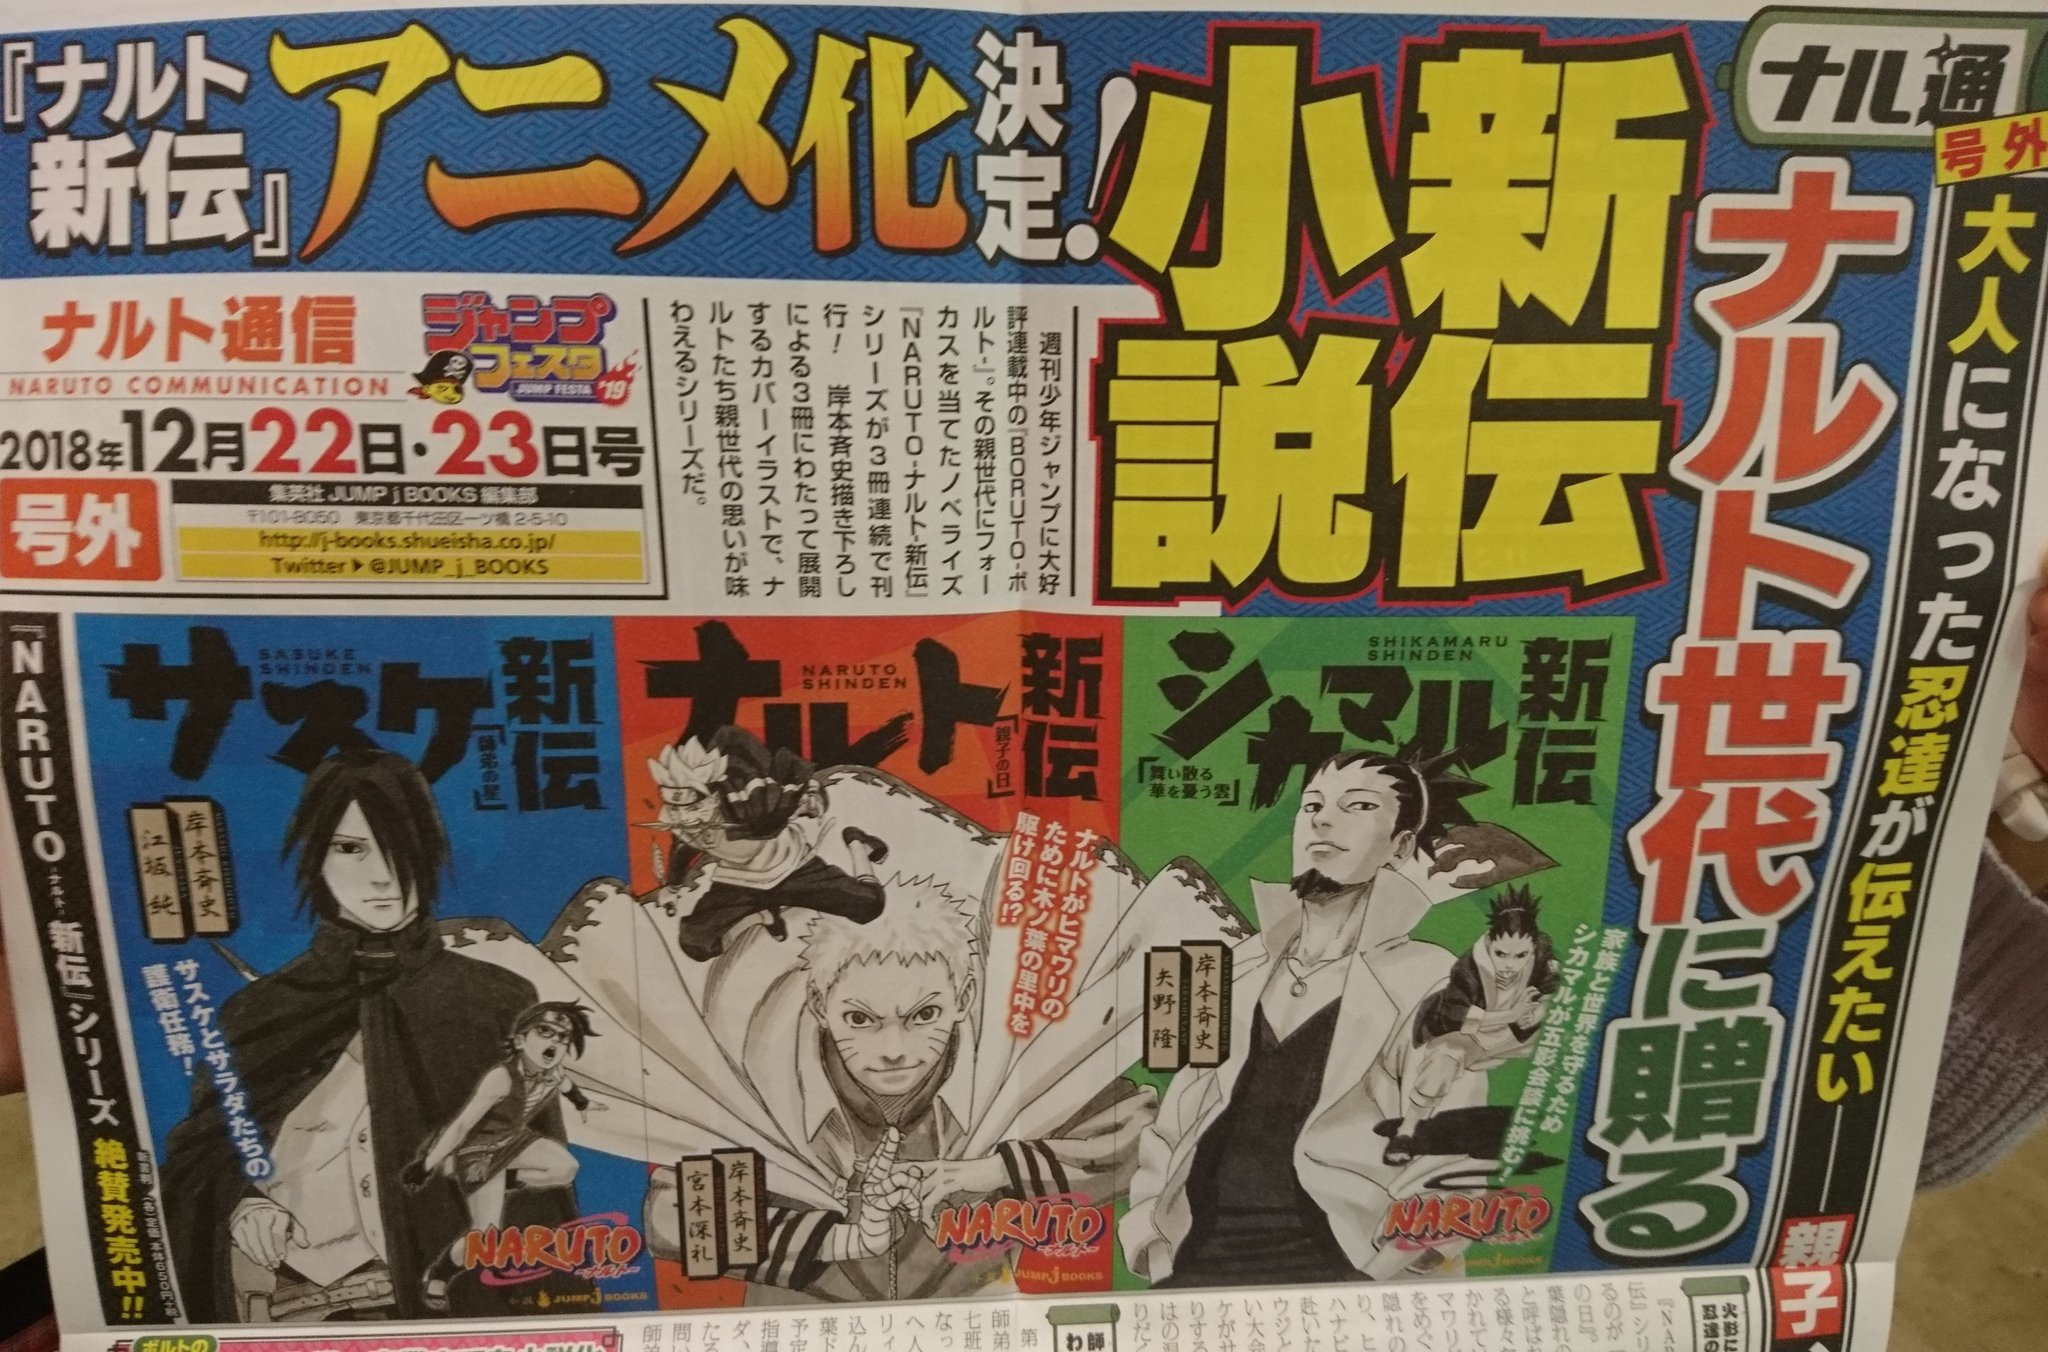 Naruto Shinden Light Novels Anime Adaptation In Boruto